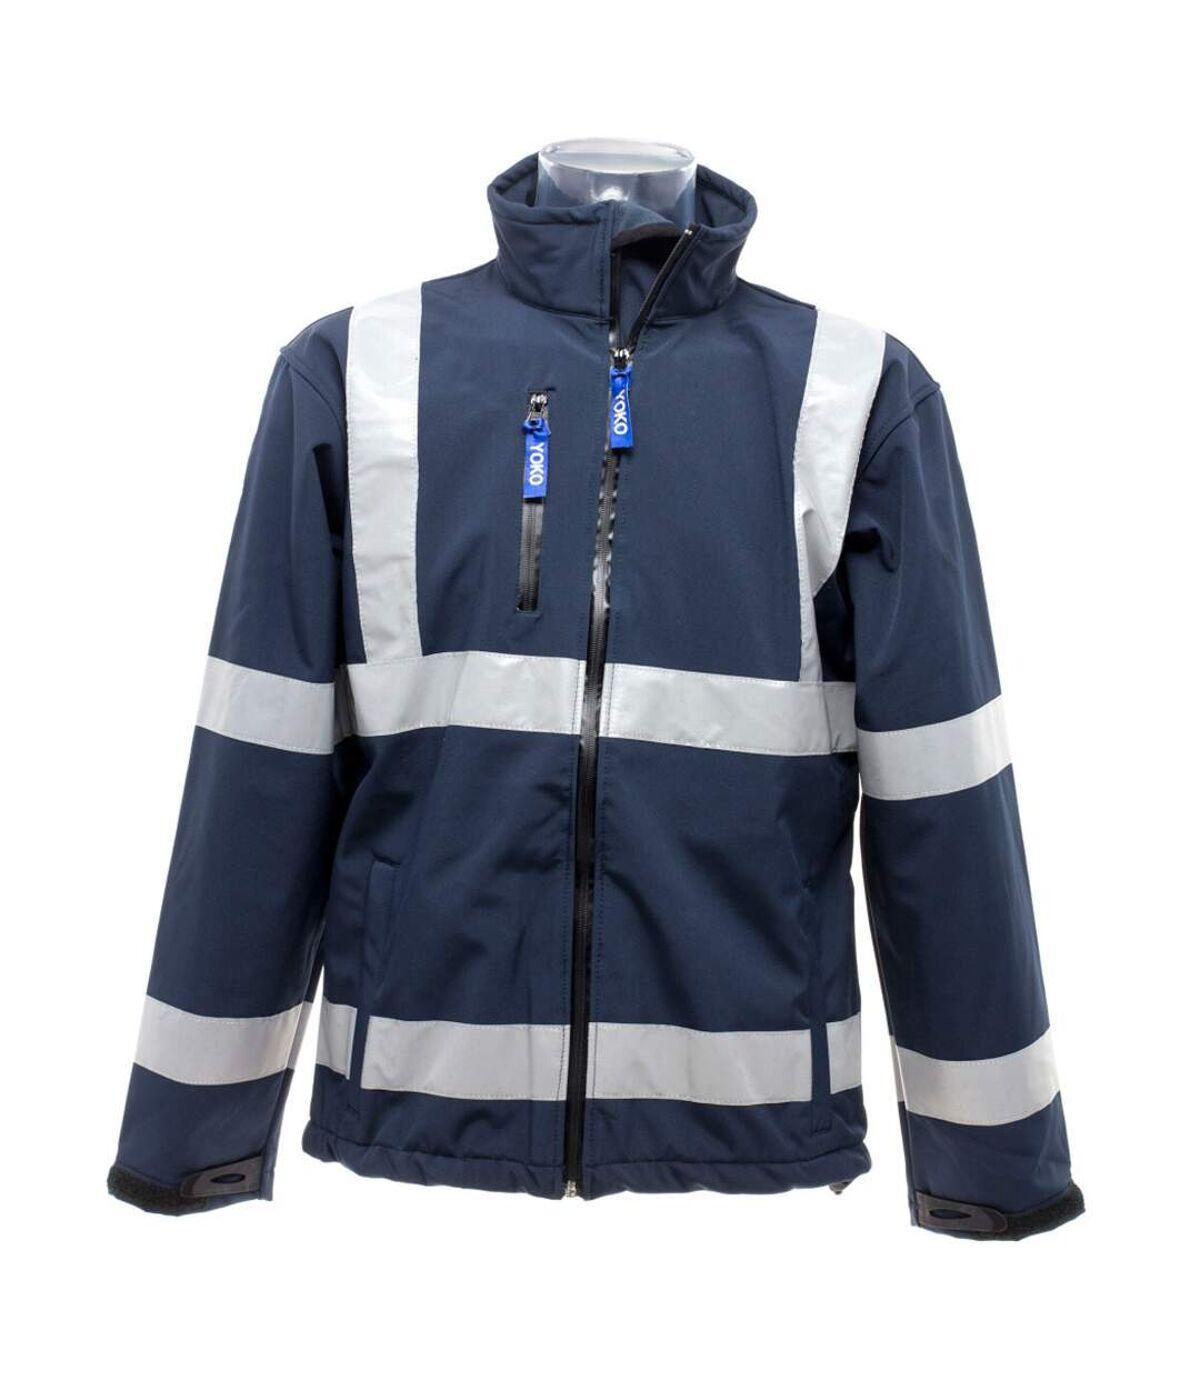 Yoko Mens Hi-Vis Sofshell Jacket (Navy Blue) - UTBC1246